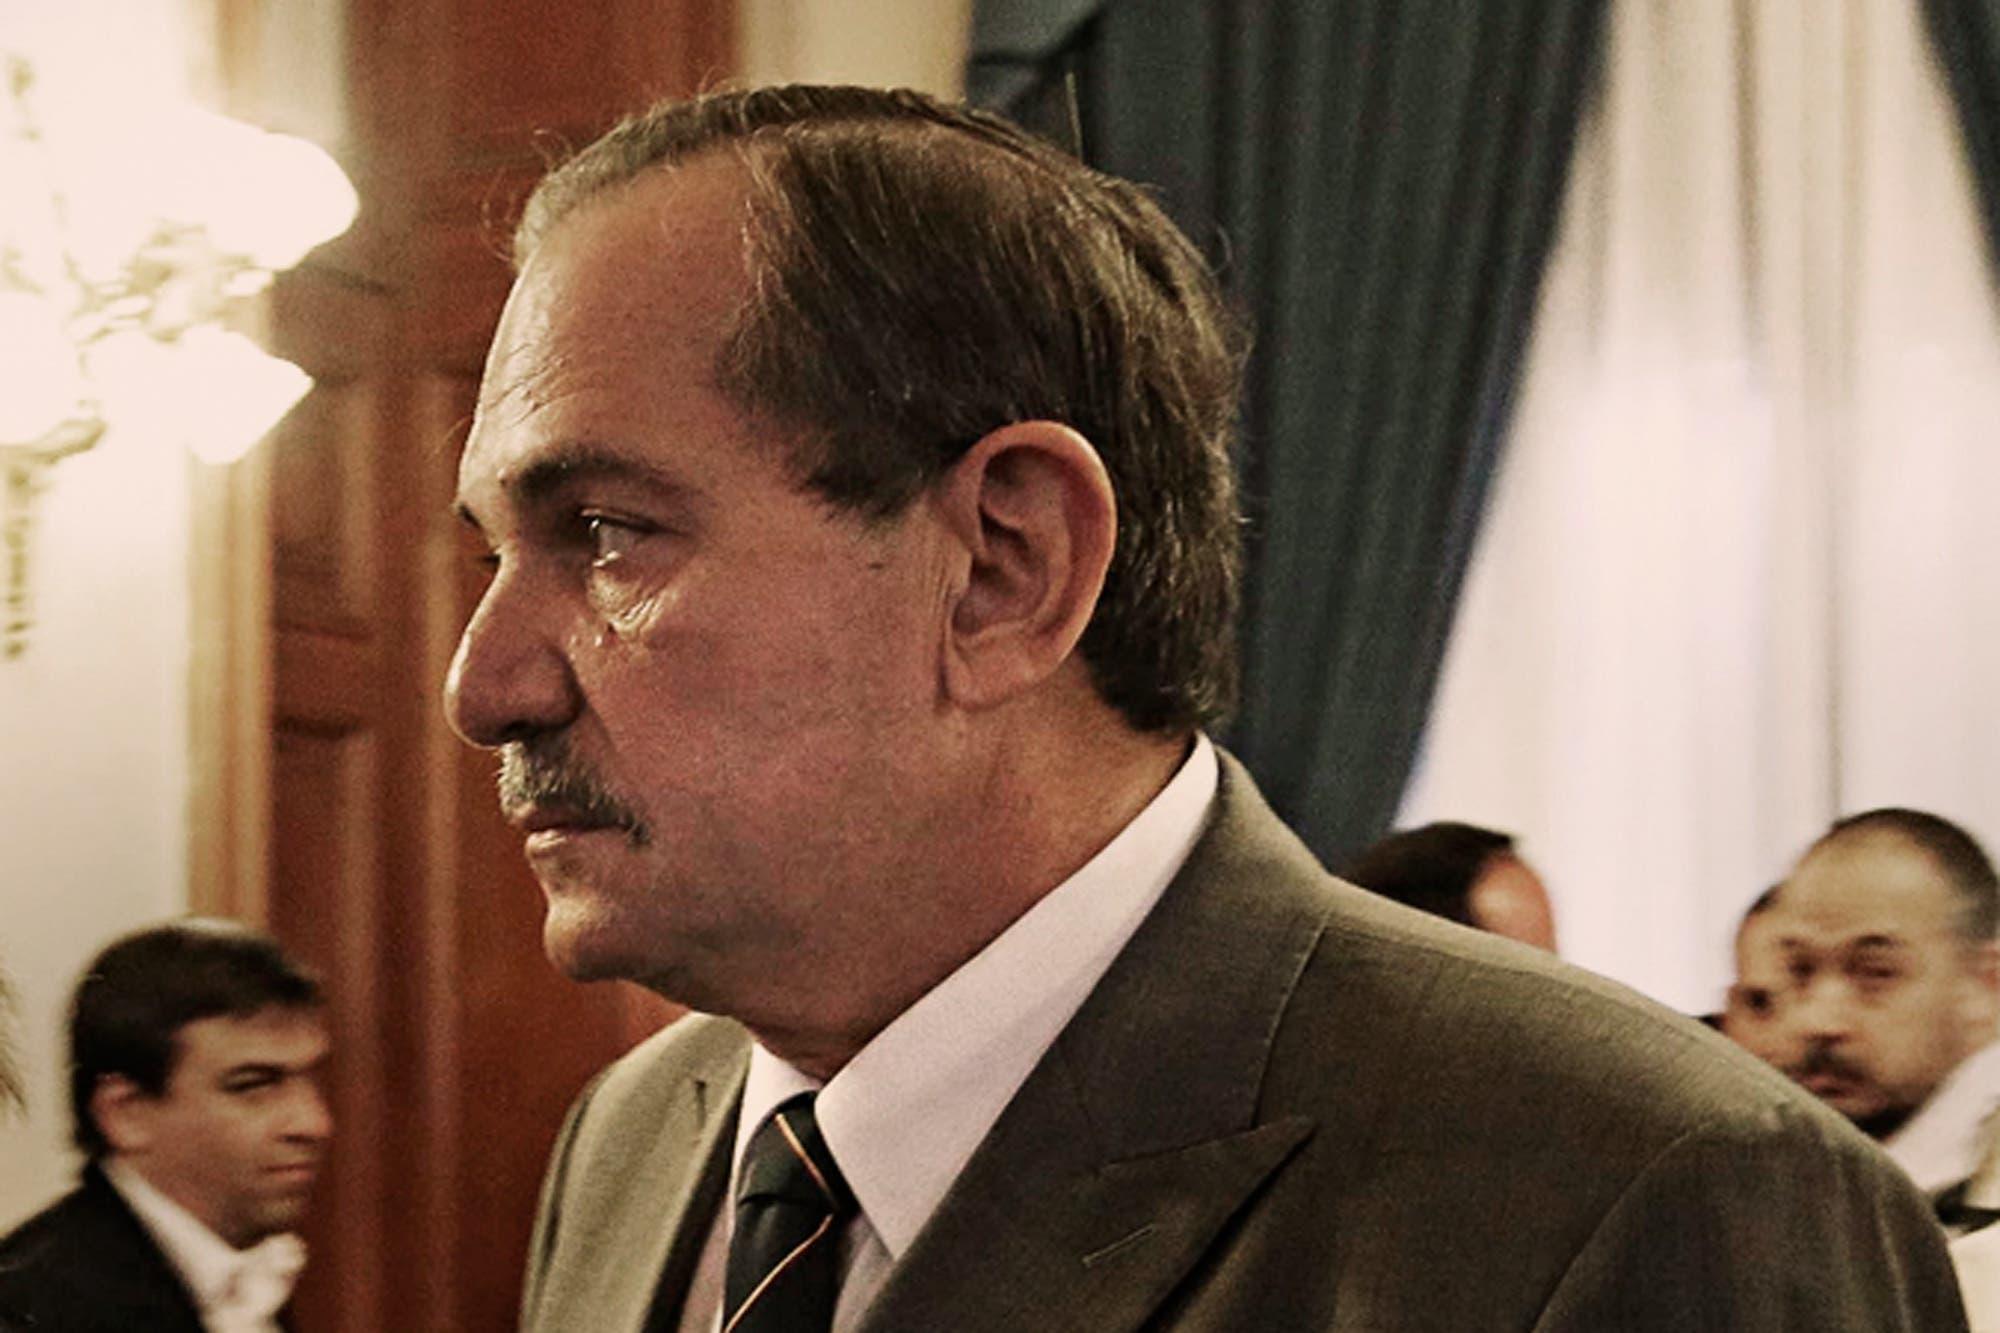 La denuncia a Alperovich: un fiscal pidió una consigna policial para cuidar a la sobrina